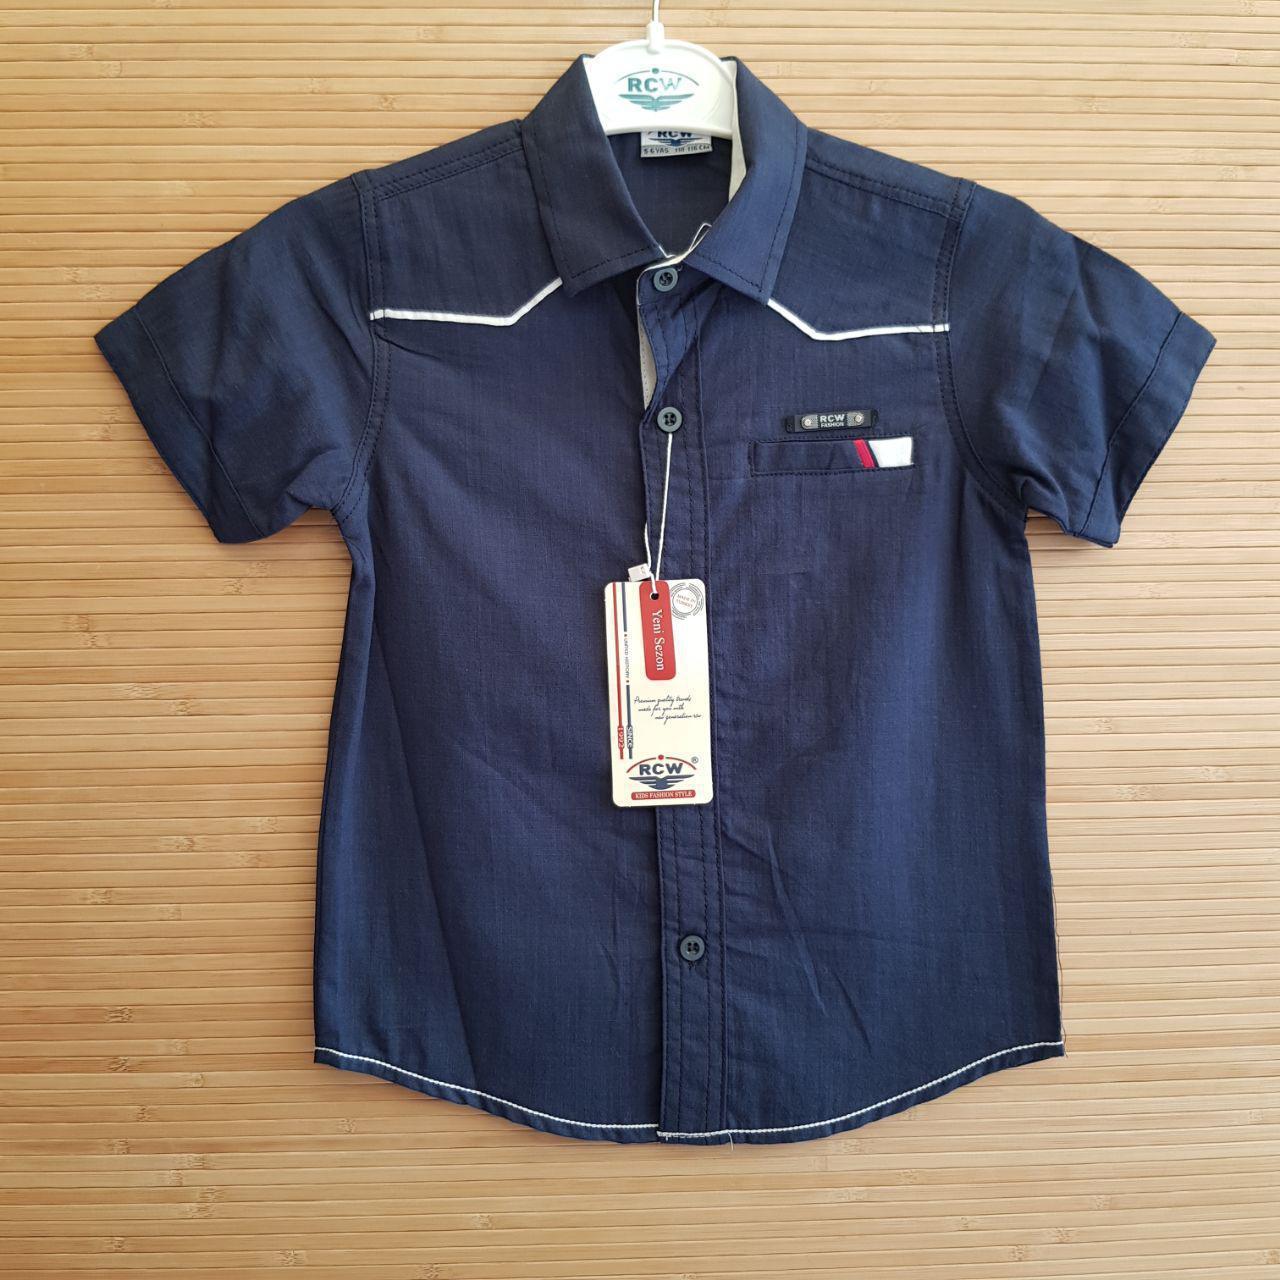 826a4e4cb0a Рубашка нарядная для мальчиков короткий рукав 1-4 лет.Турция (Pufudi ...